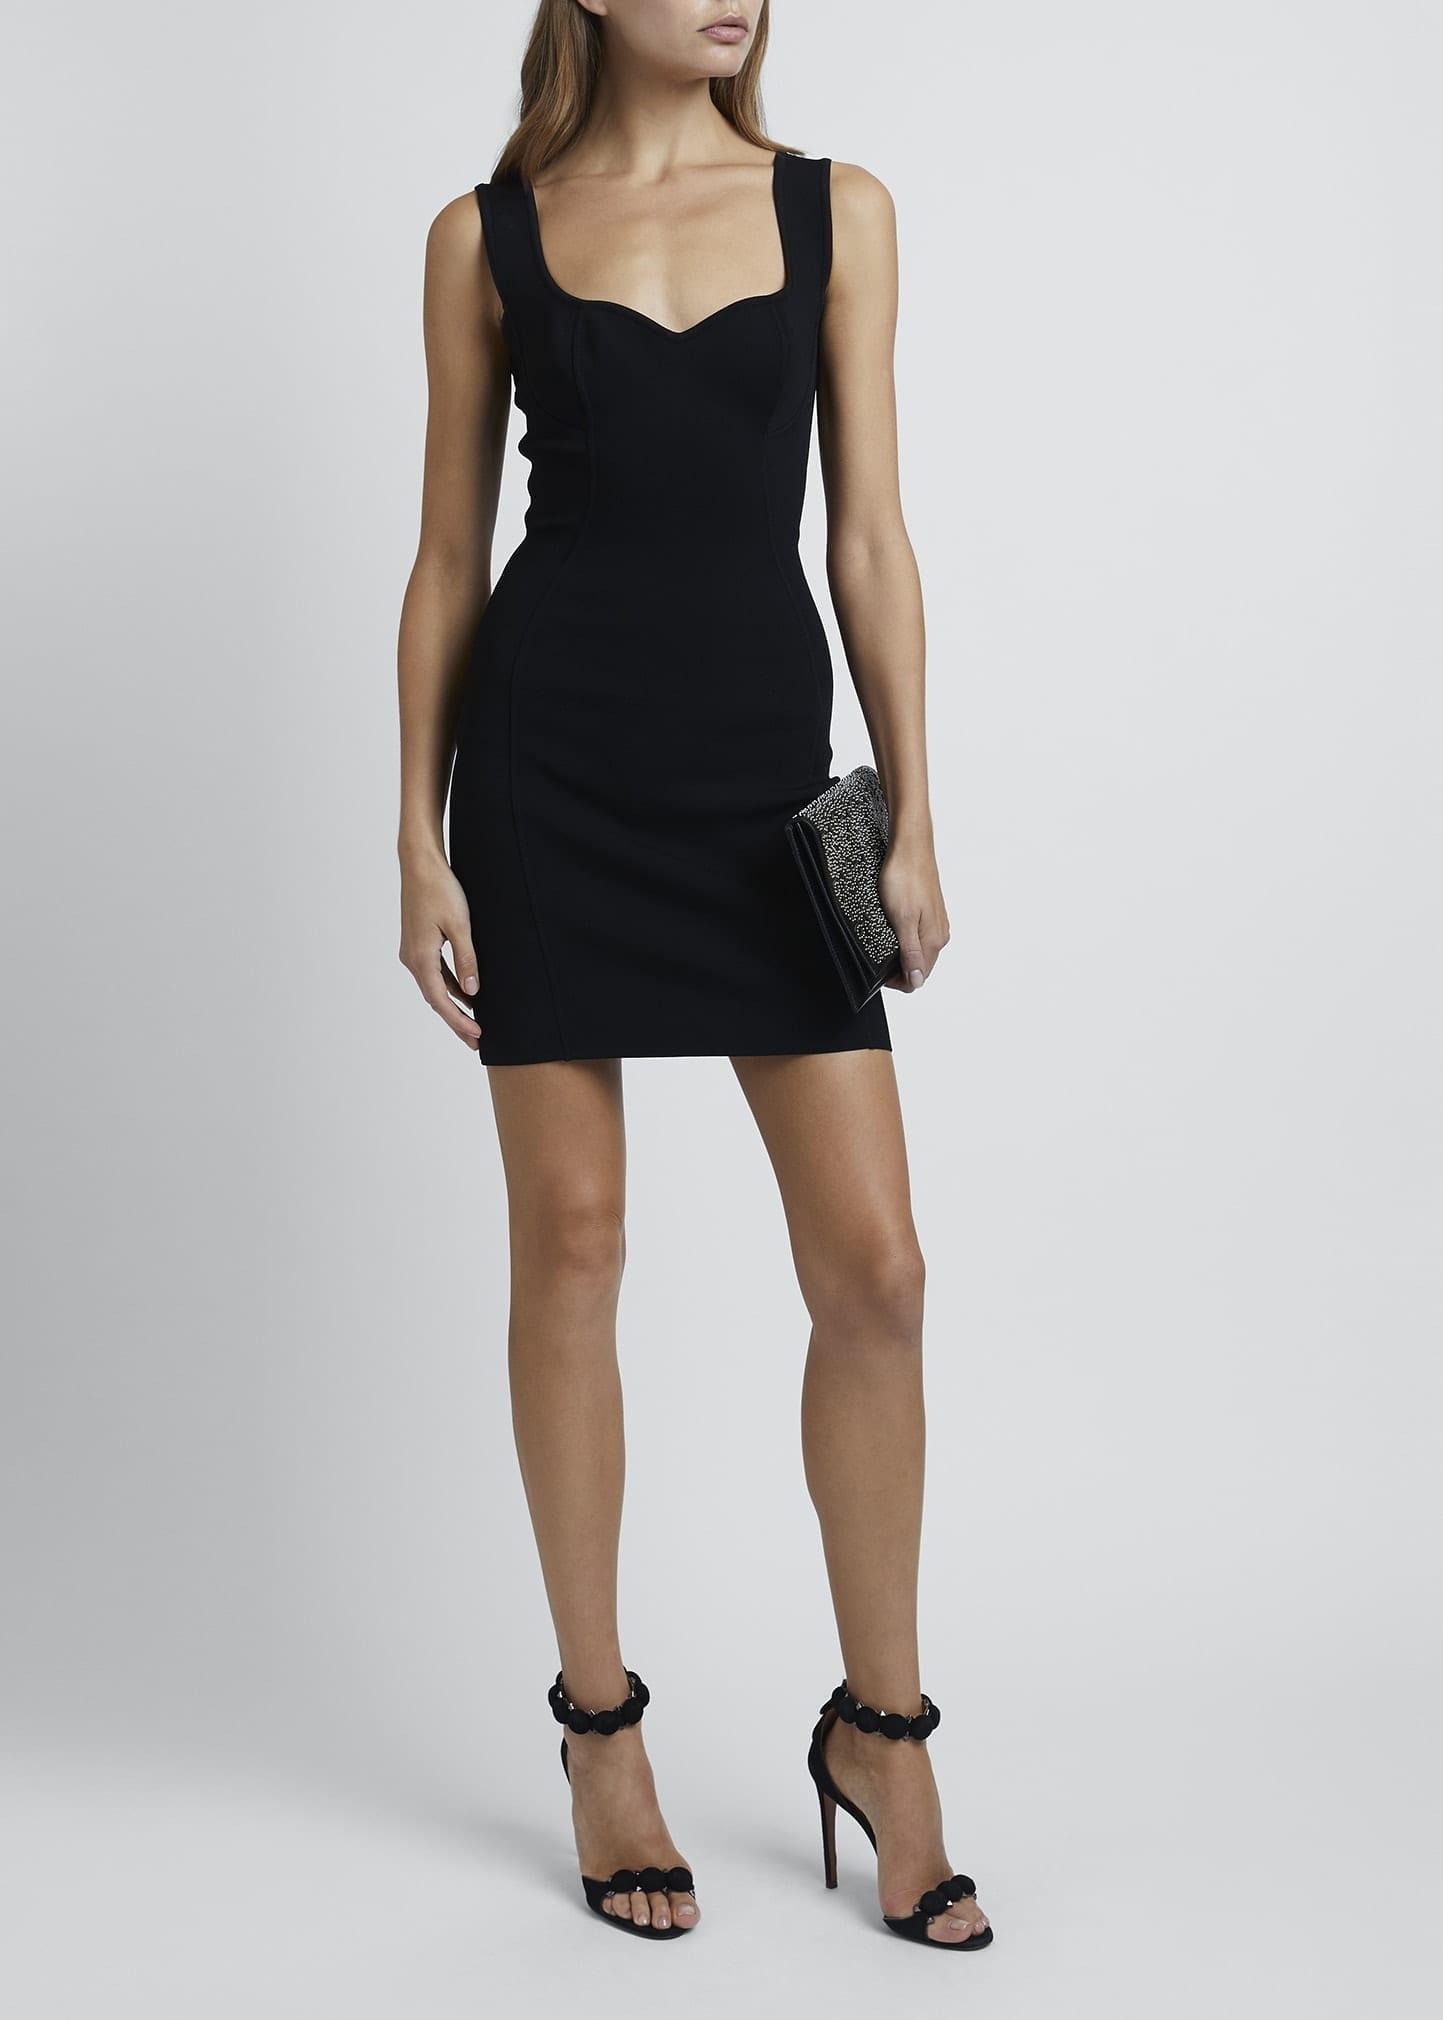 ALAIA Corset Sleeveless Bodycon Dress